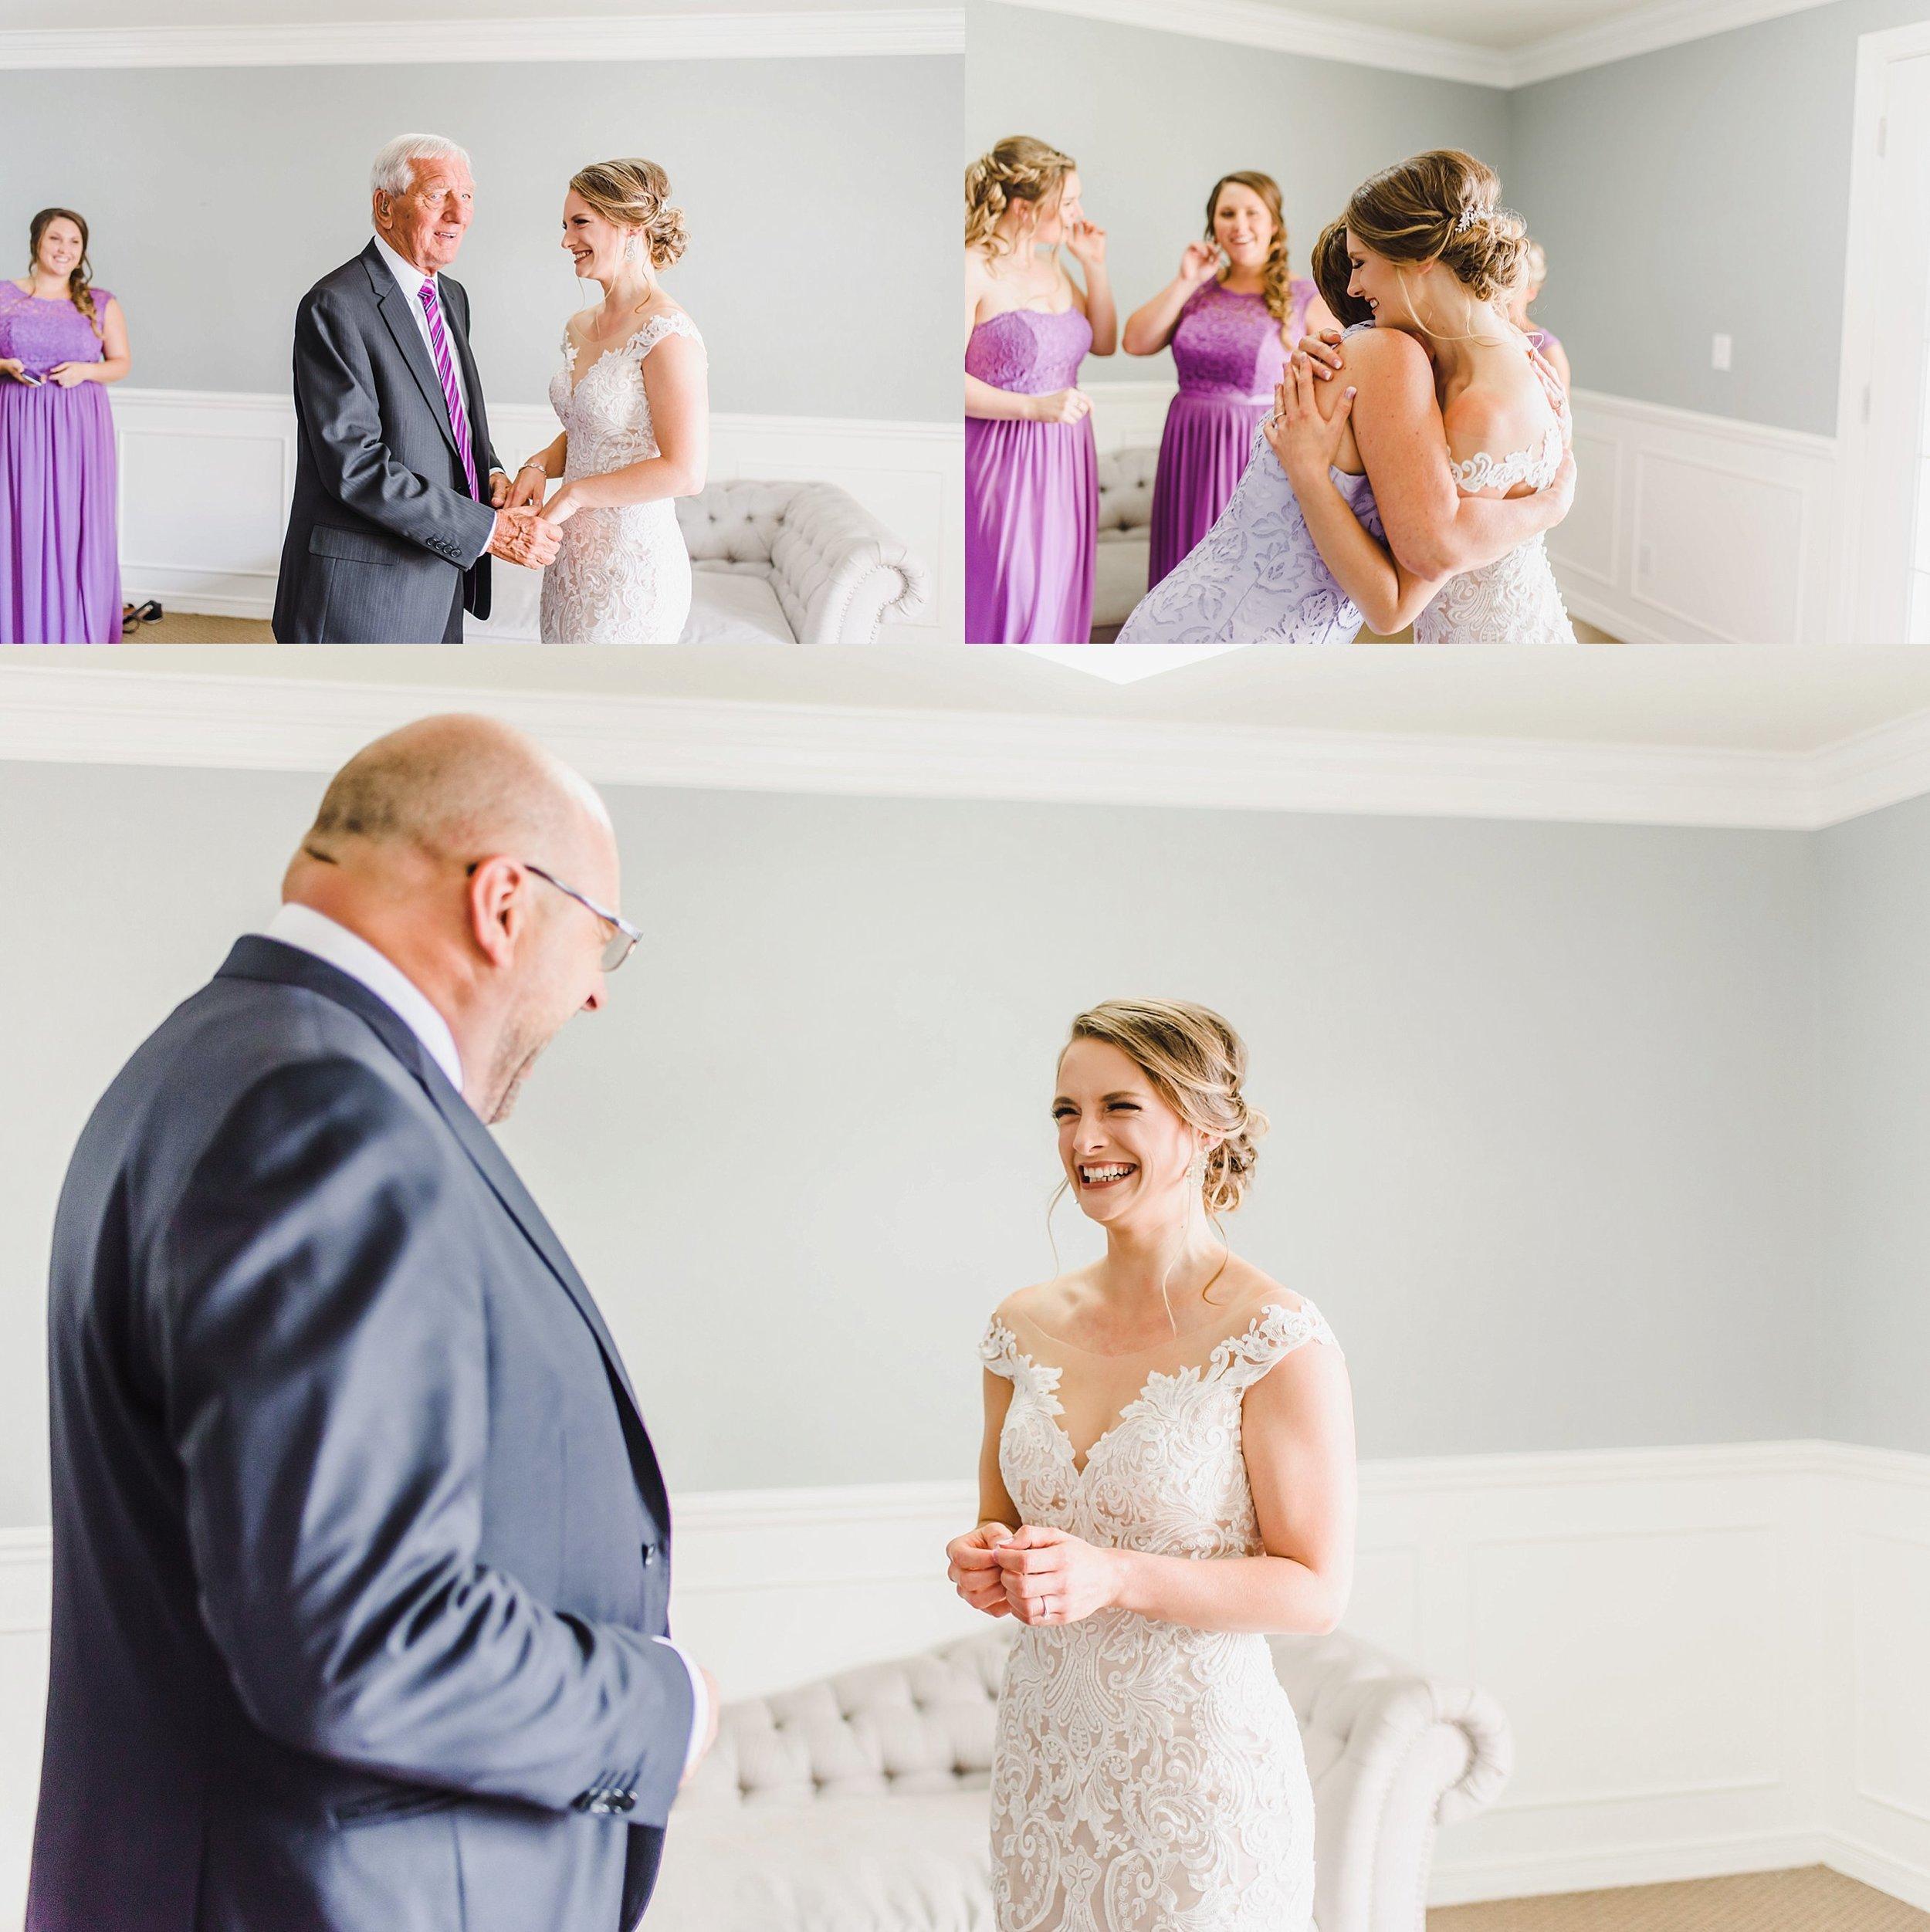 light airy indie fine art ottawa wedding photographer | Ali and Batoul Photography_1236.jpg